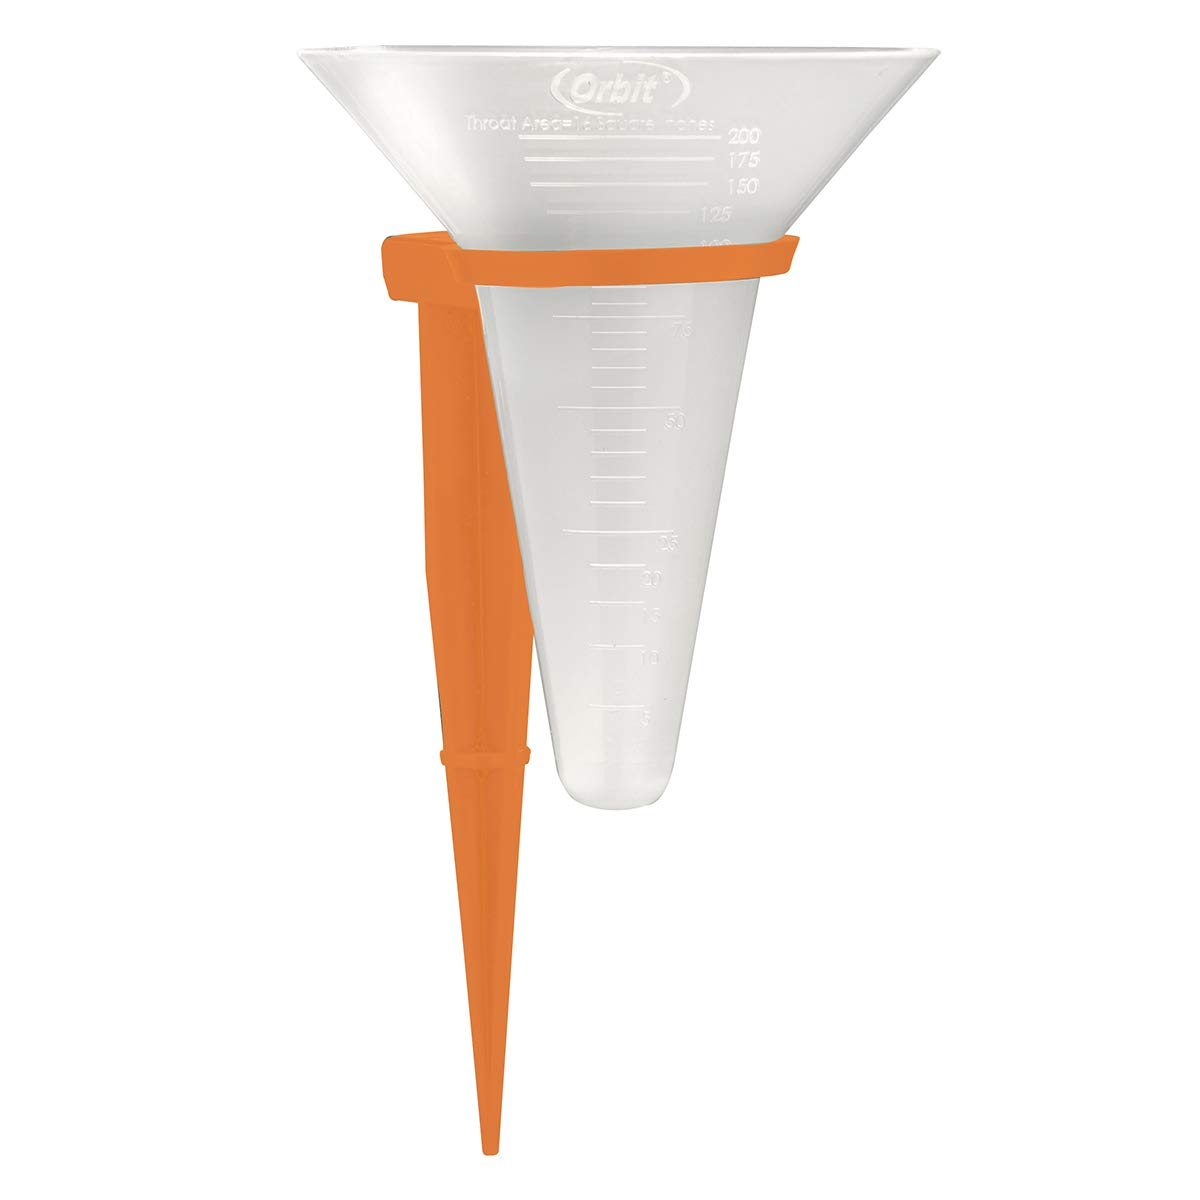 Orbit 26250 Sprinkler Catch Cups